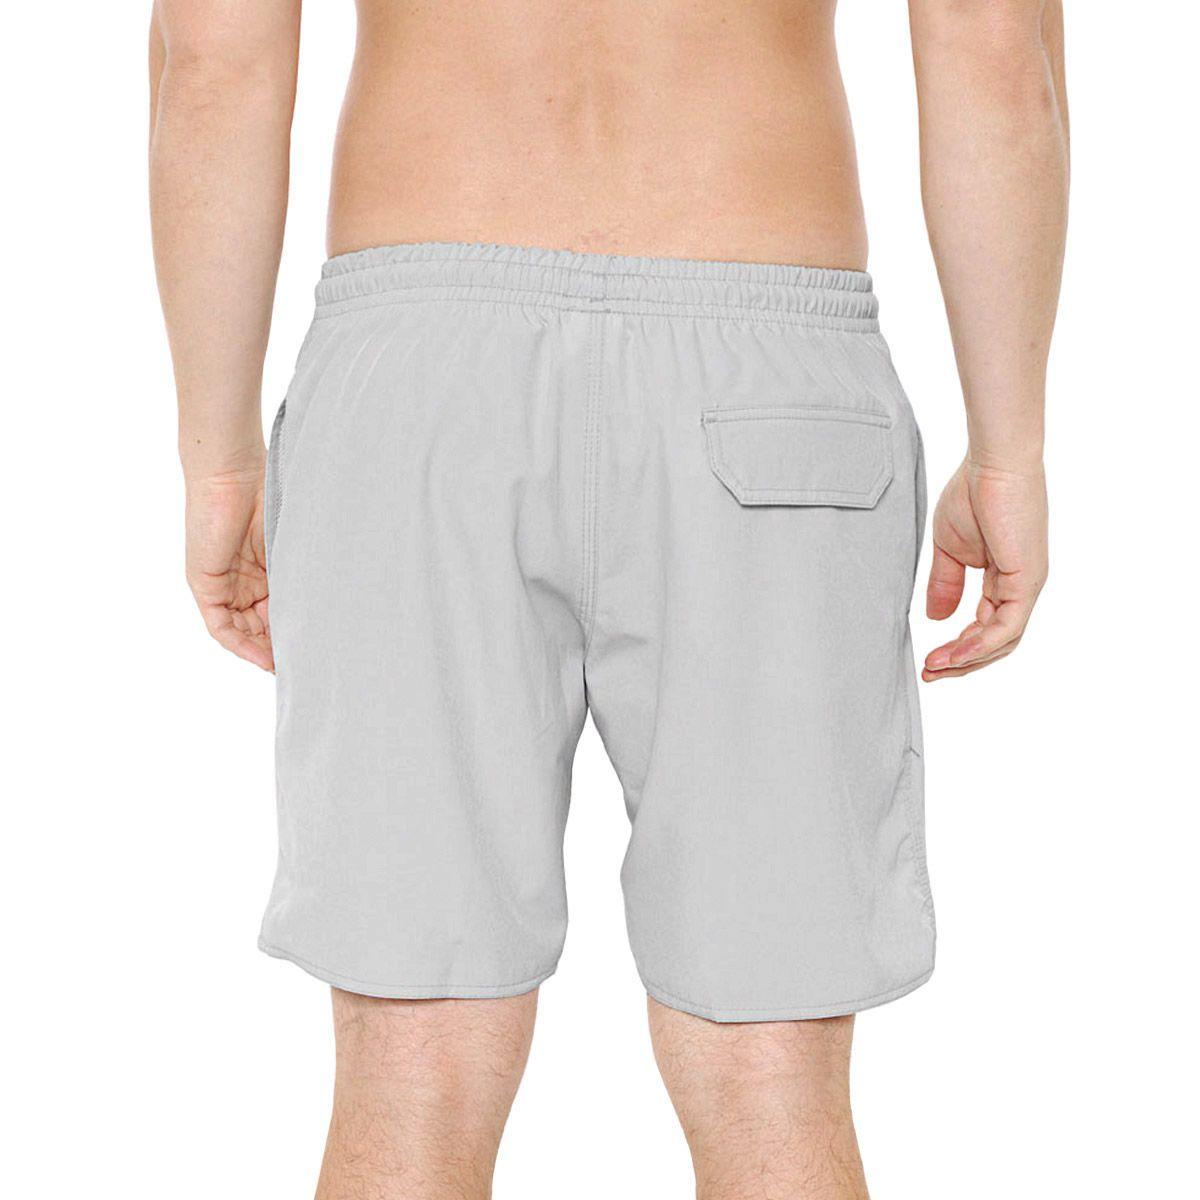 Short Masculino Liso Lupo Beachwear